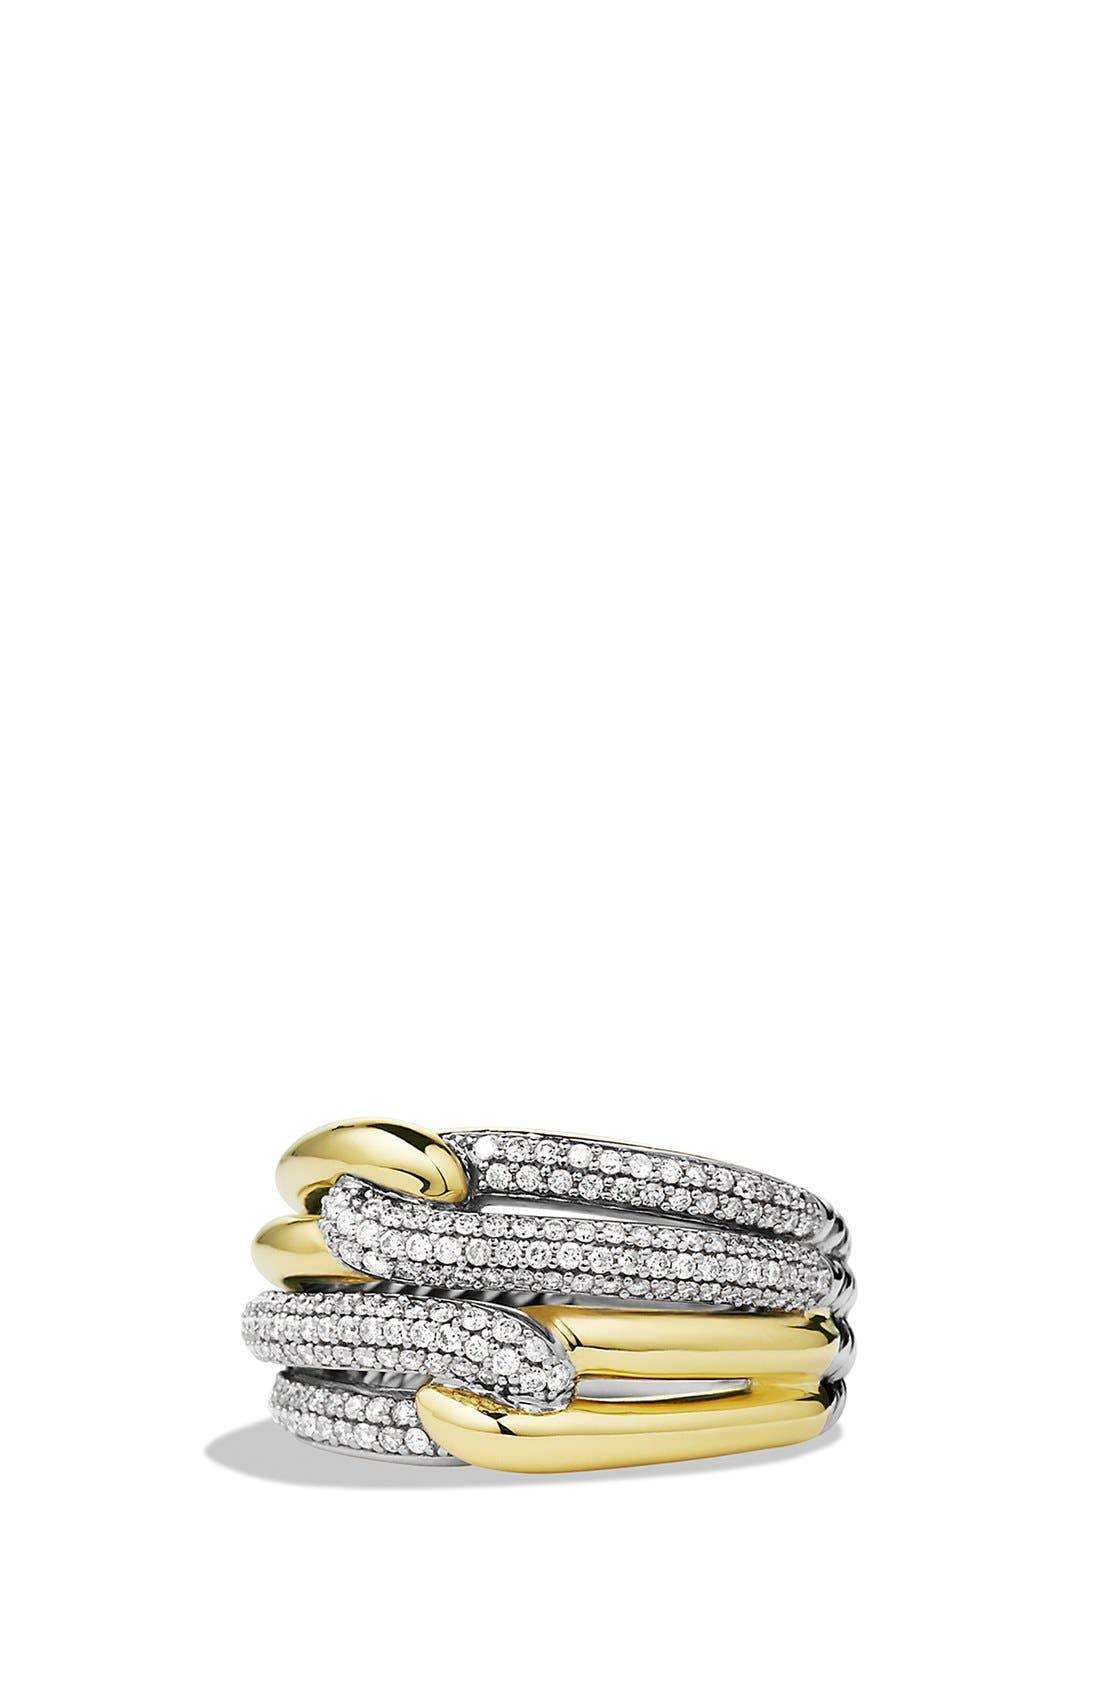 Main Image - David Yurman 'Labyrinth' Double Loop Ring with Diamonds and Gold